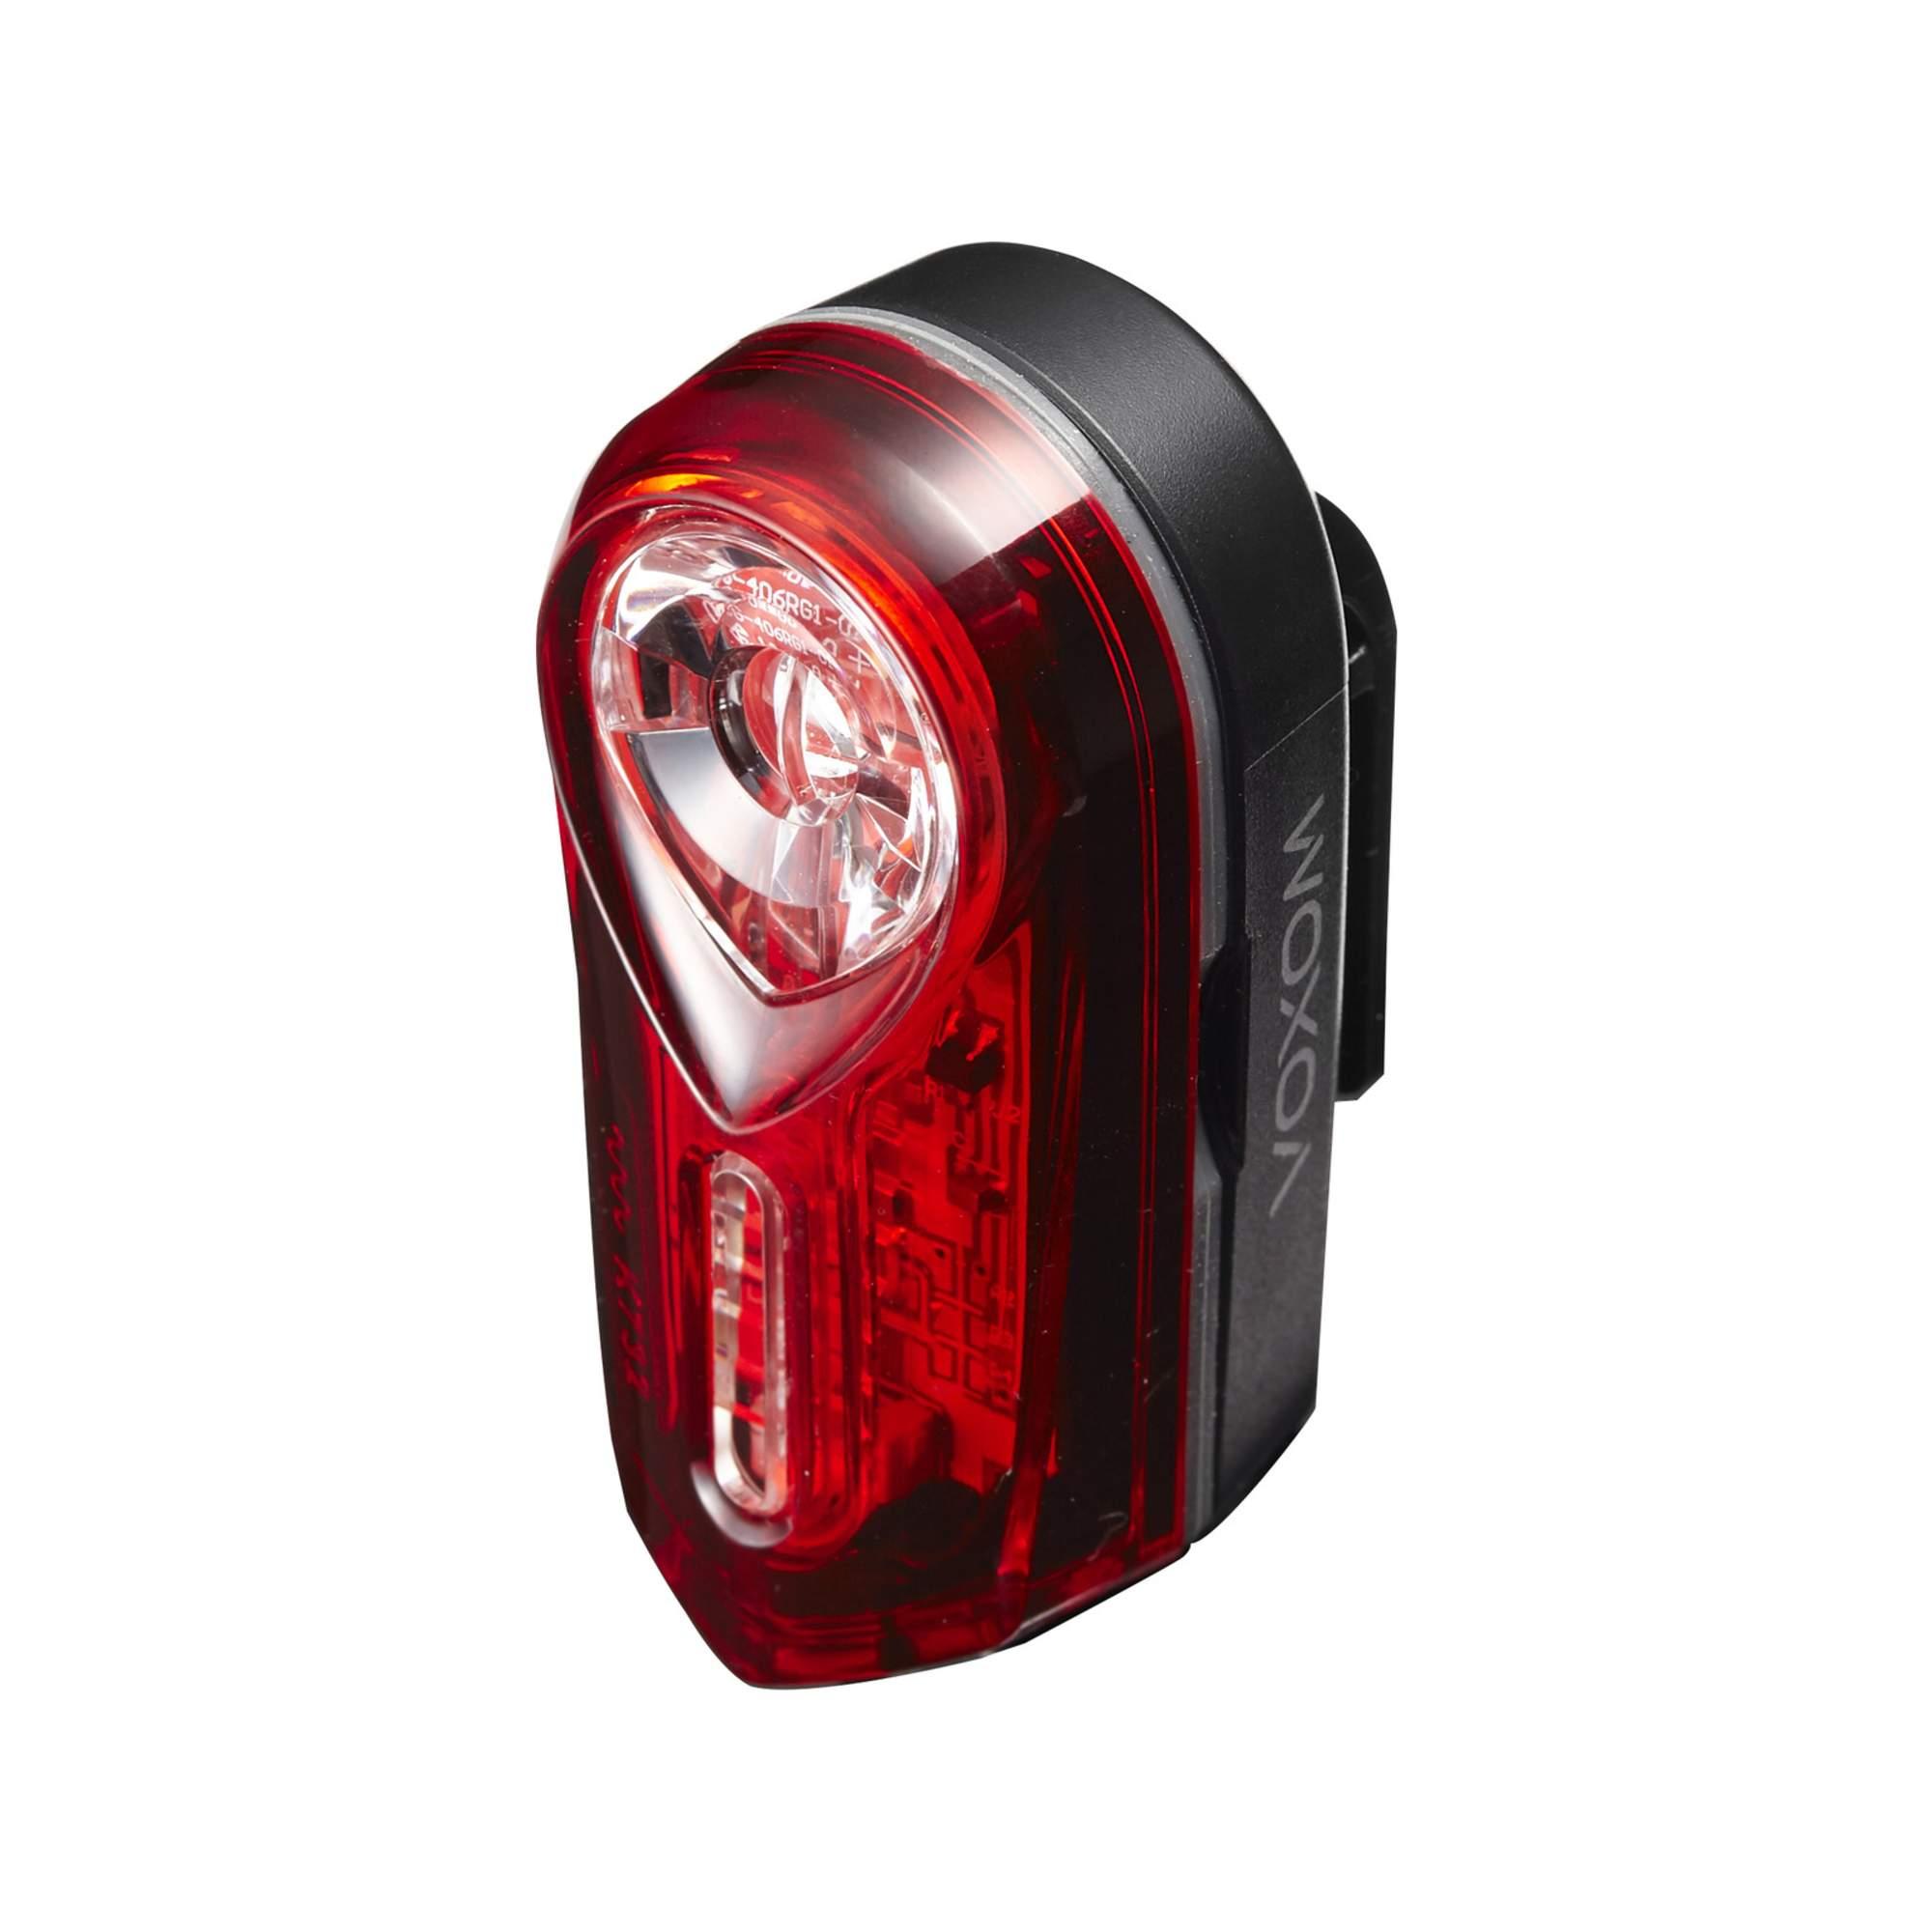 Voxom RÜCKLICHT LH5 - Fahrradbeleuchtung - rot